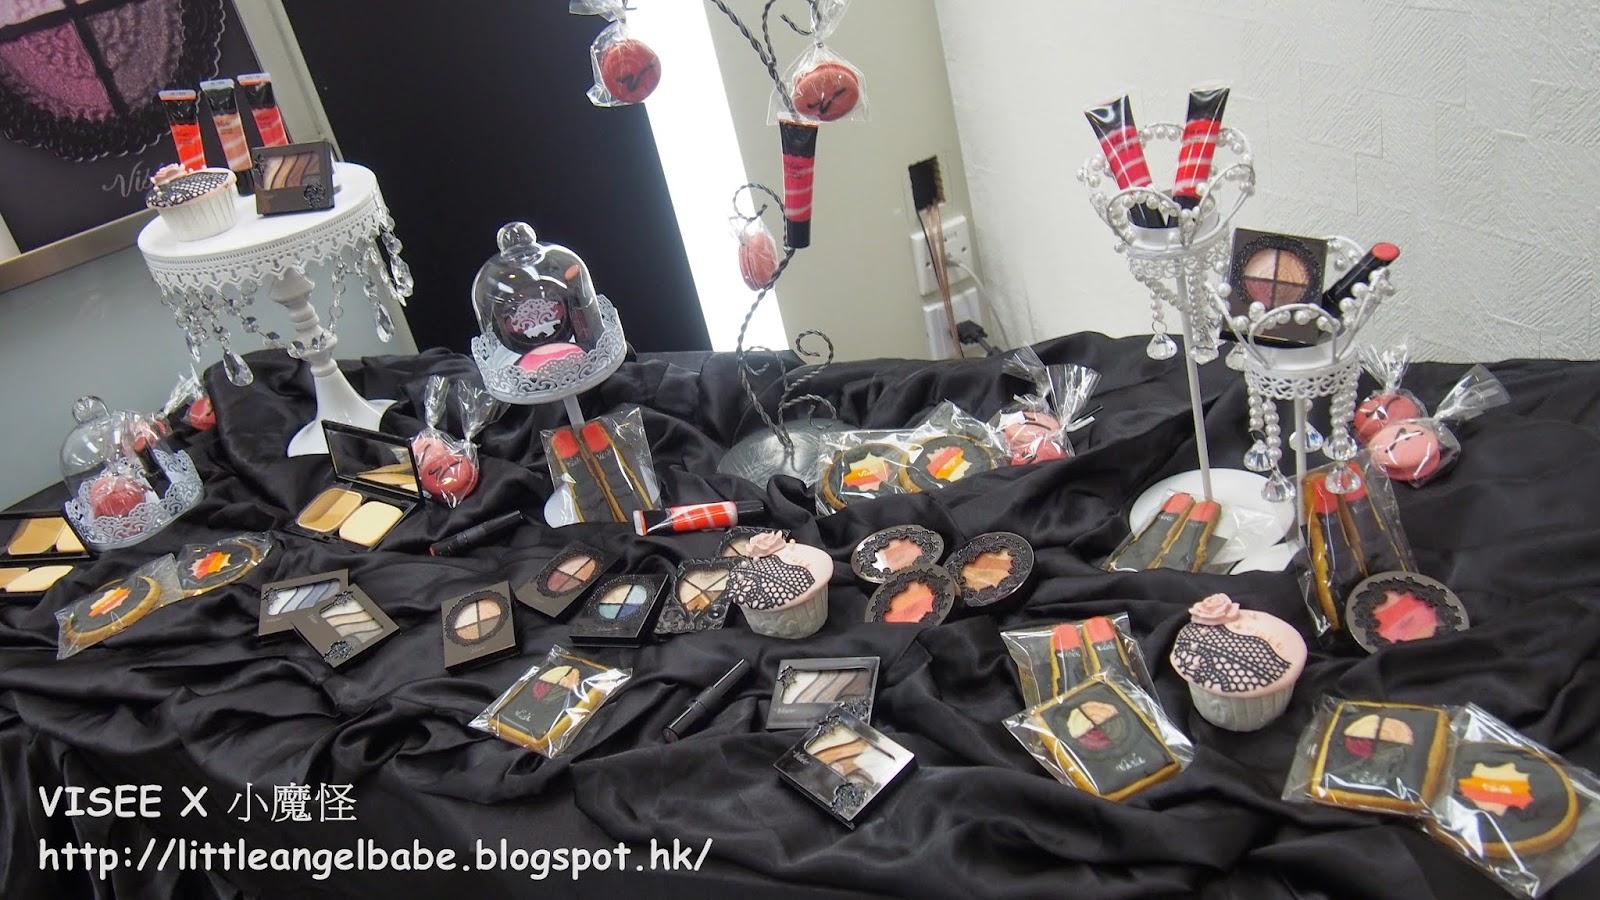 http://3.bp.blogspot.com/-PJ1ikukXOM8/U-zrPGWhNsI/AAAAAAABBuc/yChREXin_LA/s1600/P6281750.JPG